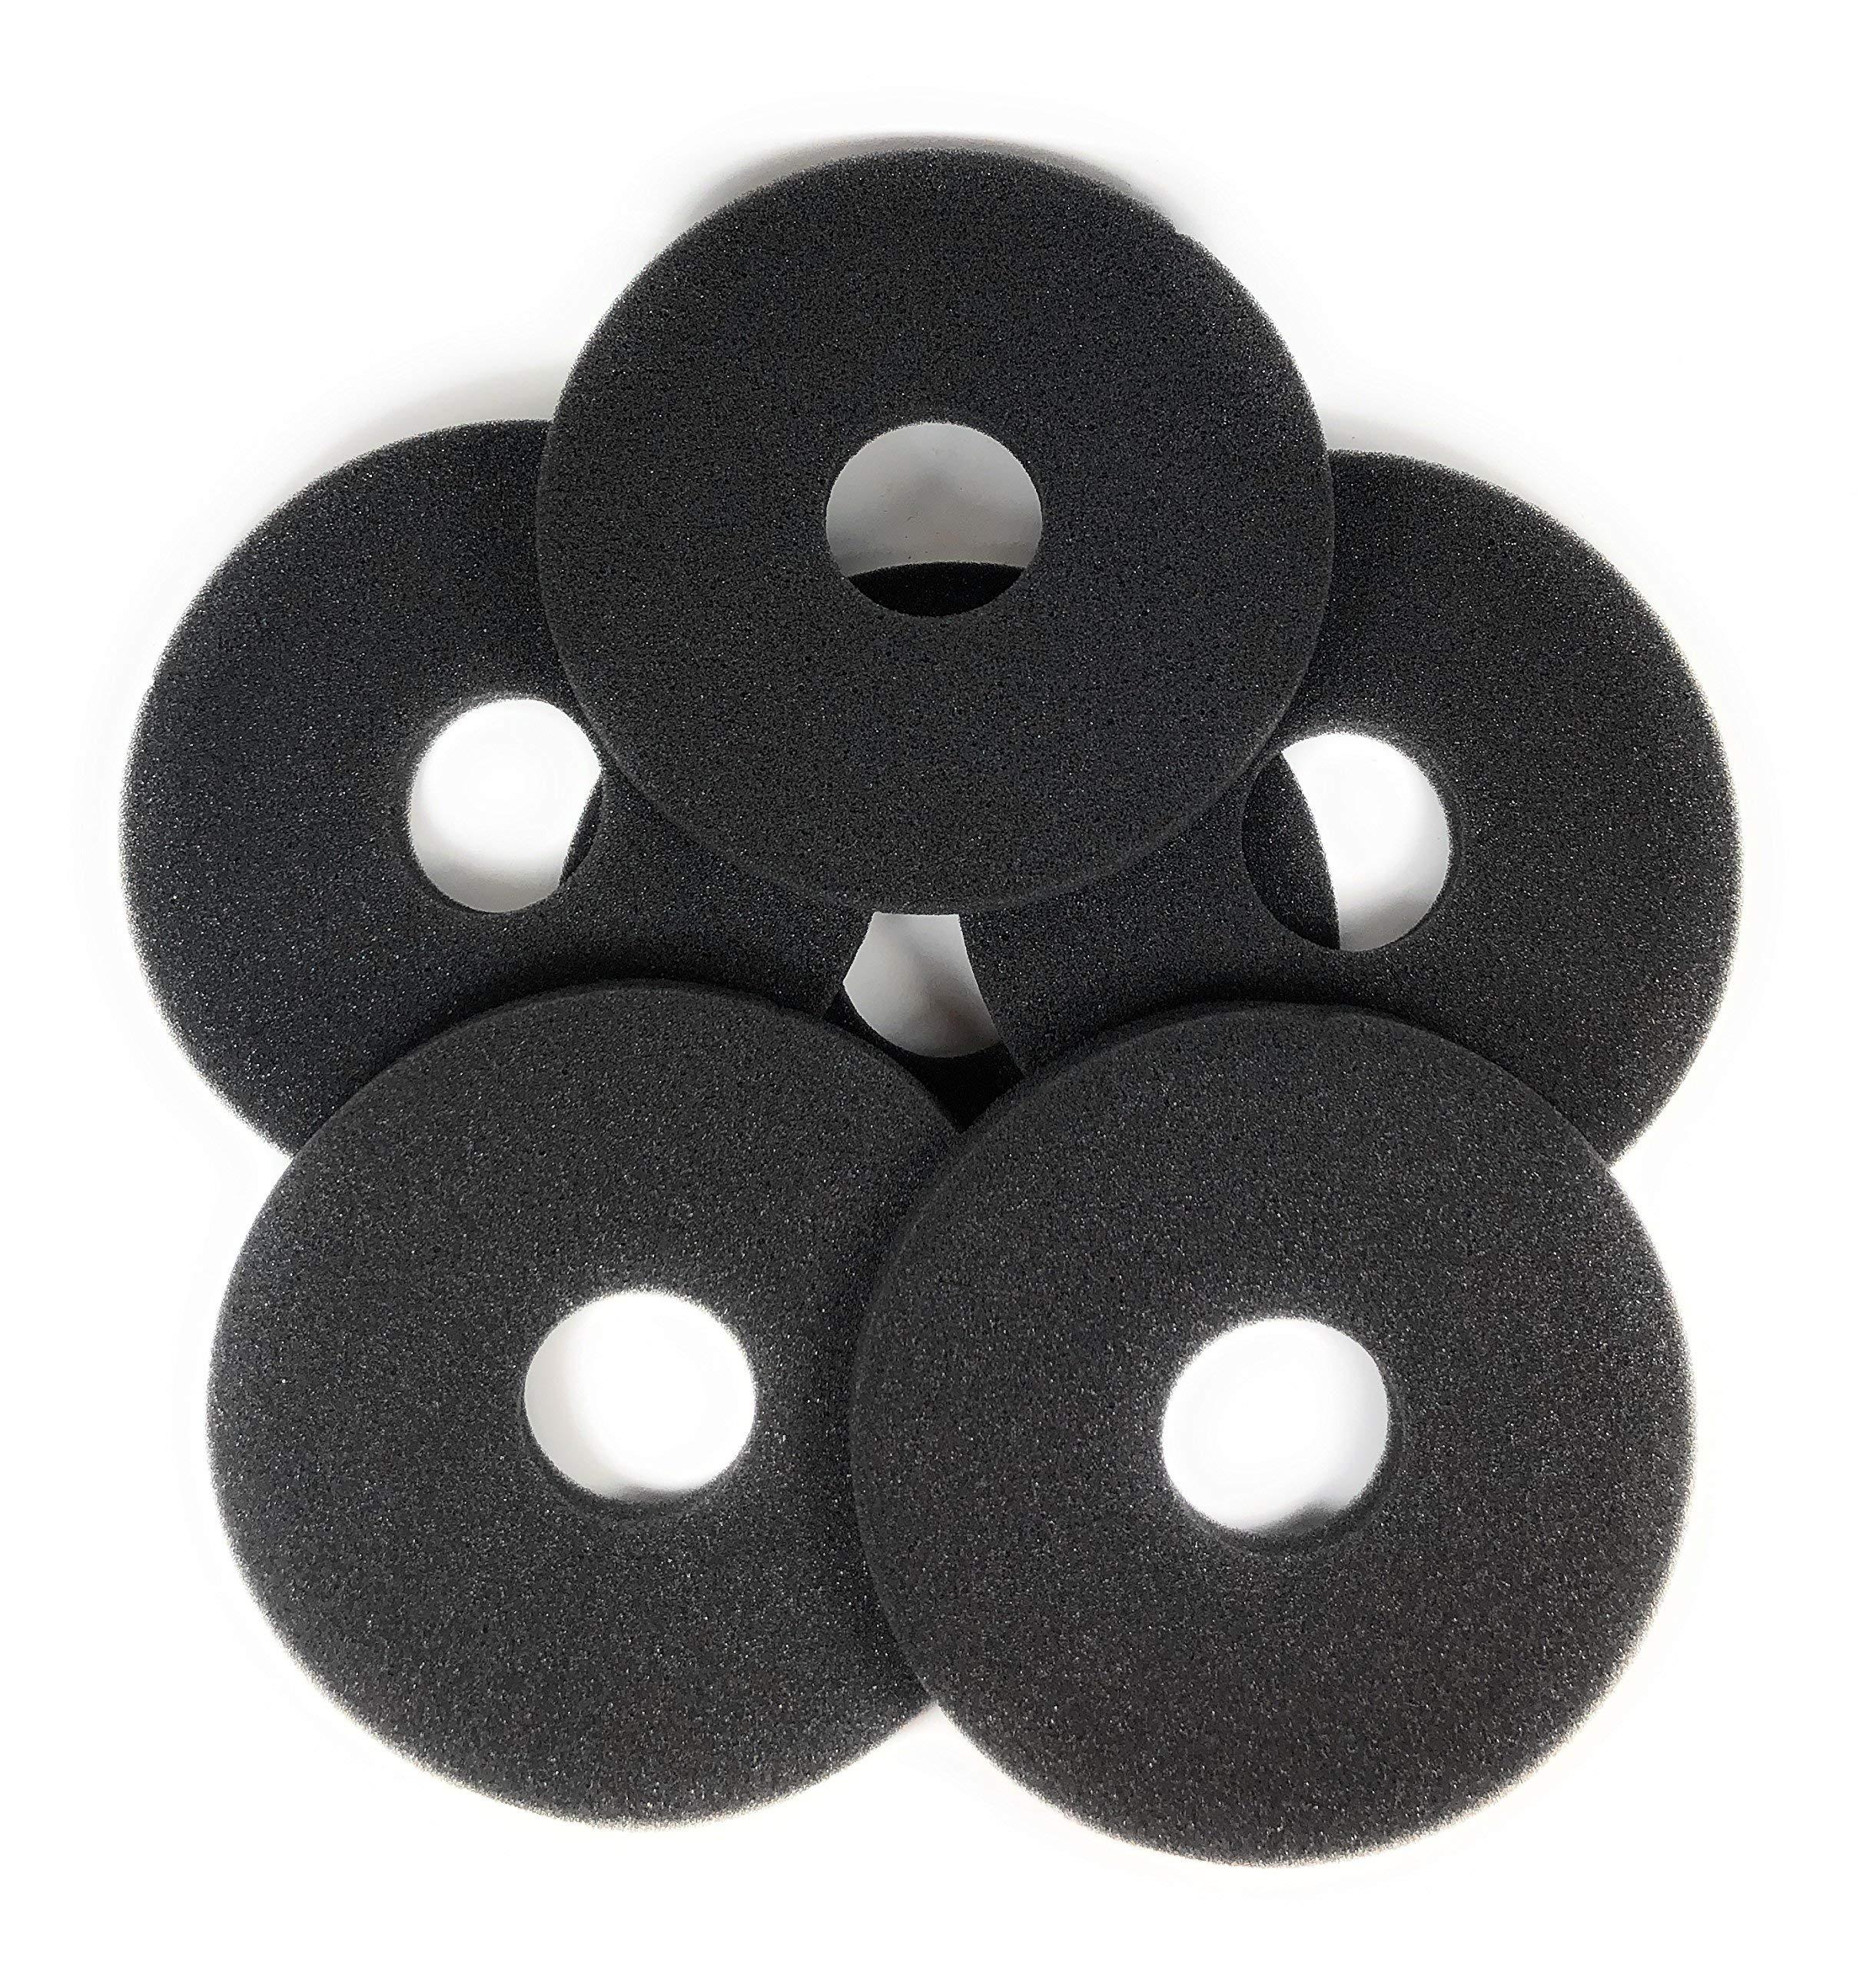 Margarita Salt Glass Bar Rimmer Replacement Sponges Set of 6, Black by SUMMIT Salt Rimmer Replacement Sponges (Image #9)